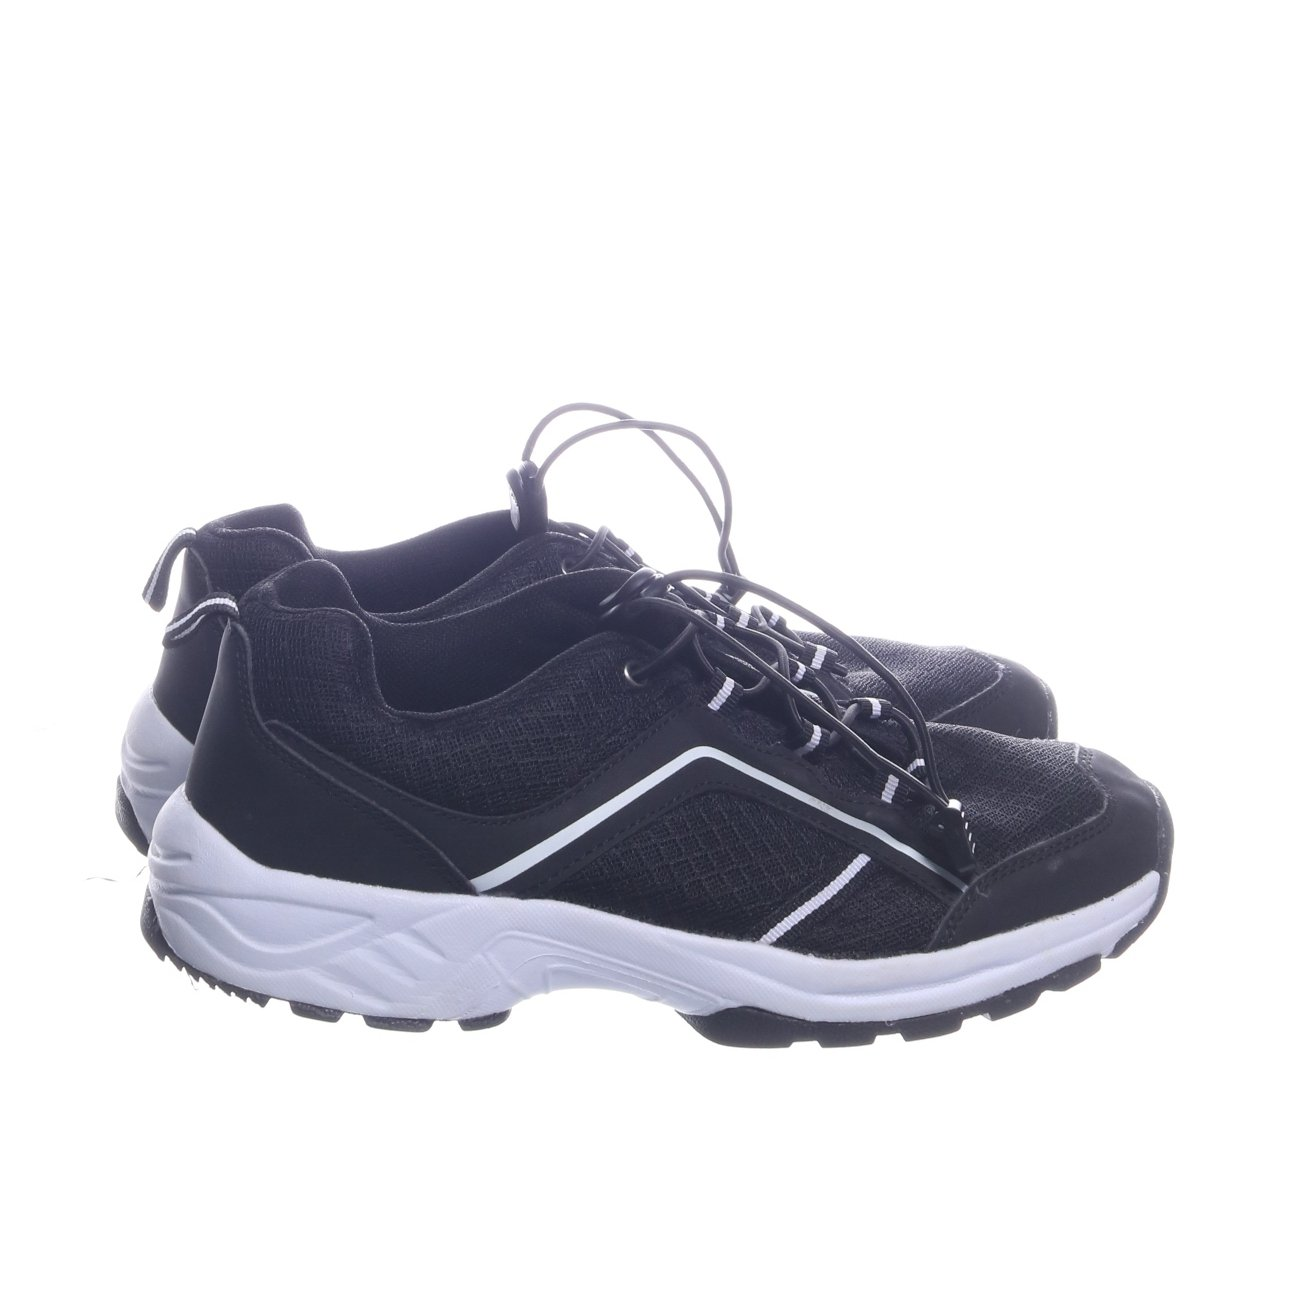 separation shoes 2eb5b ce80b Löparskor, Strl  41, Svart Vit (348336382) ᐈ Sellpy på Tradera